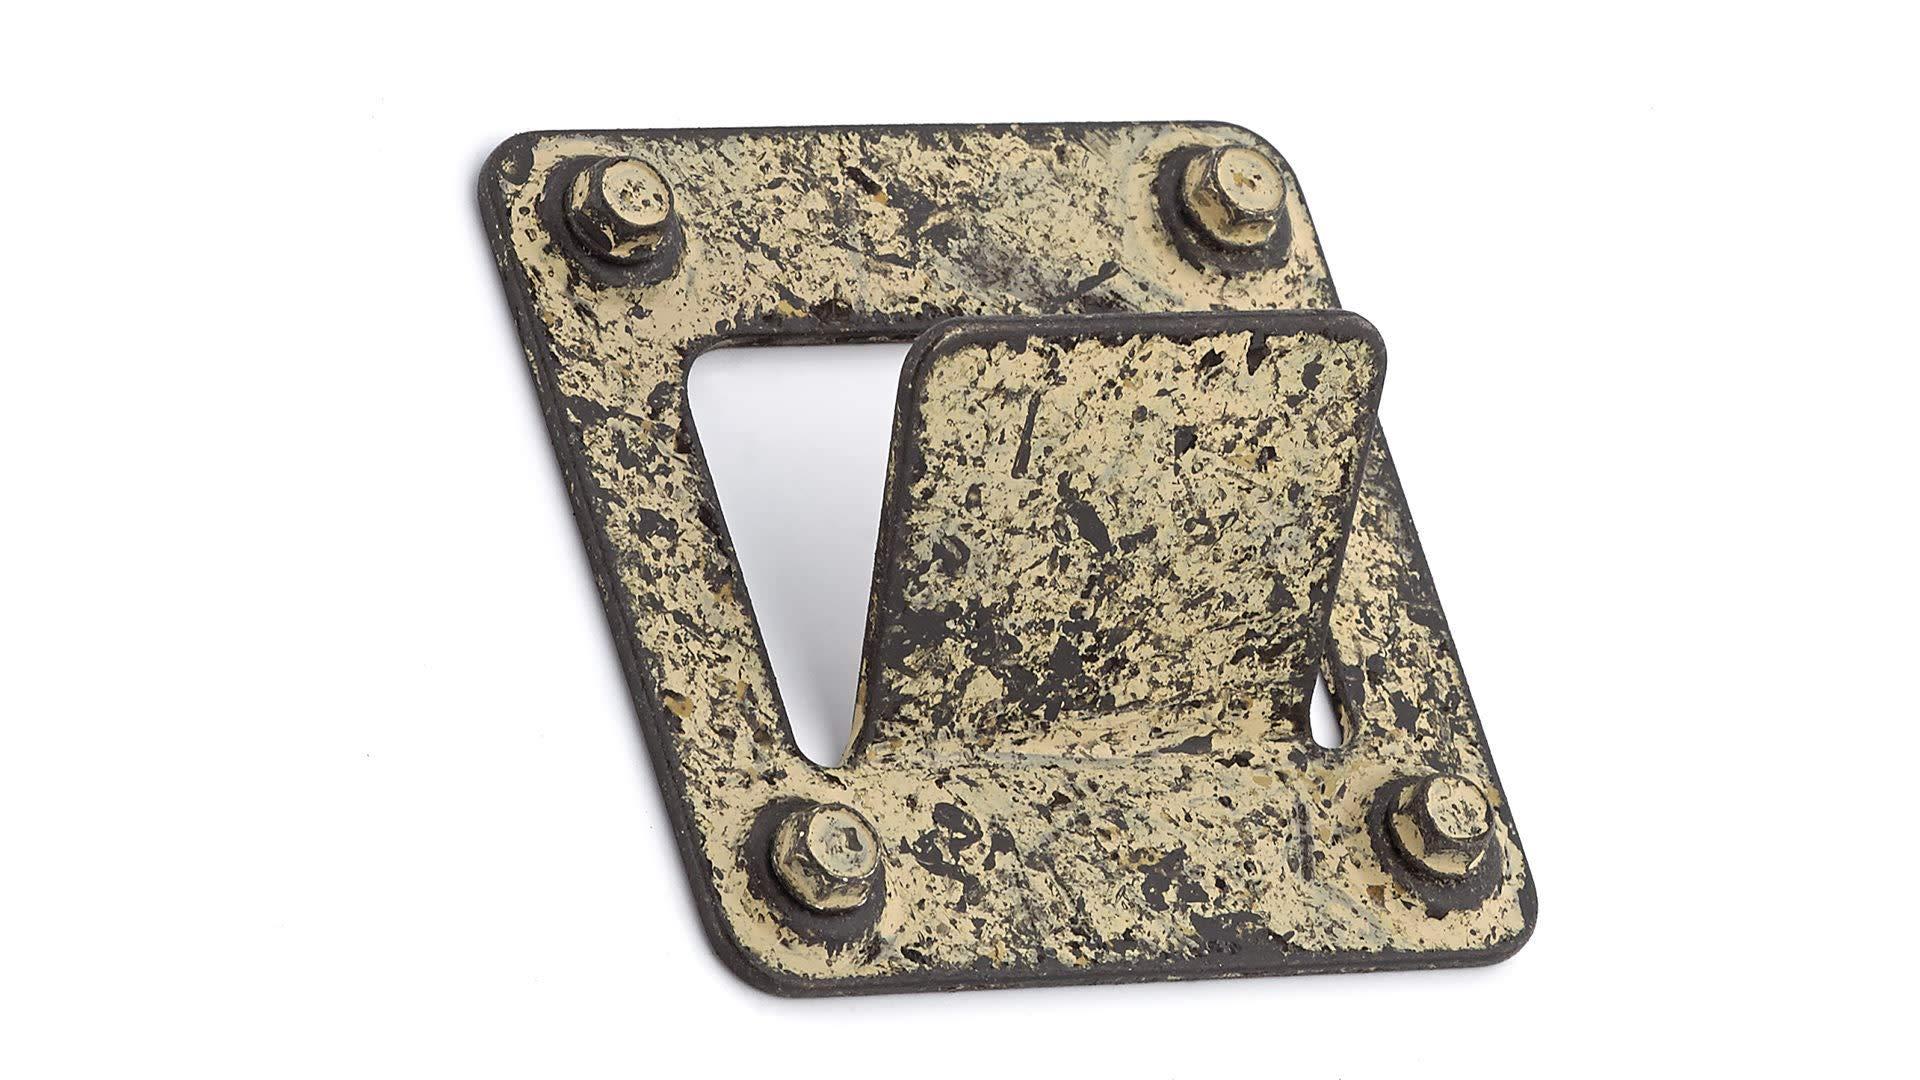 Richelieu Hardware RH1313011210 Contemporary Metal Hook, Tuscany Finish